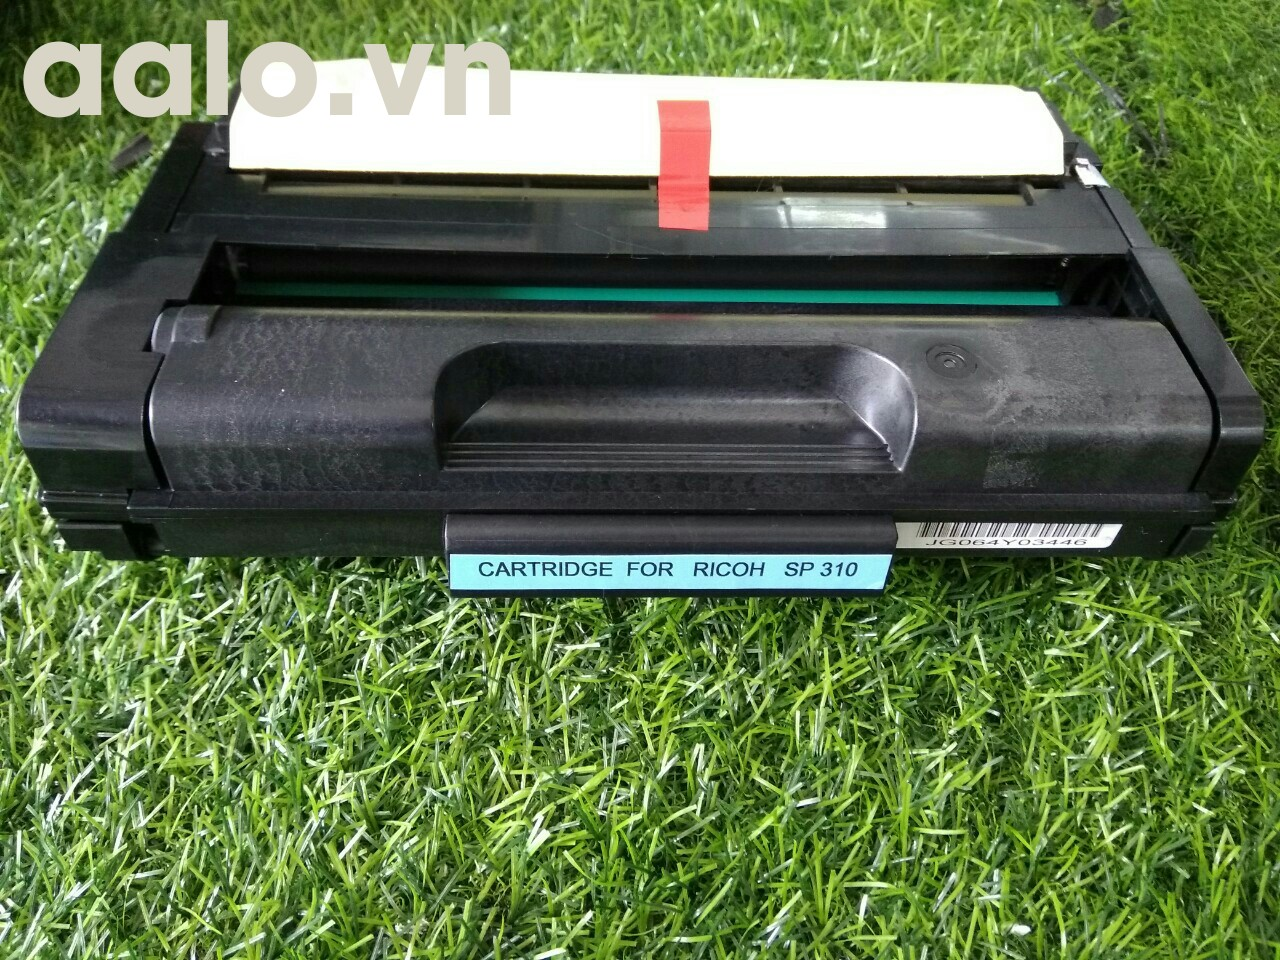 Hộp Mực Cartridge RI-SP310 dùng cho máy in Ricoh 310sfn